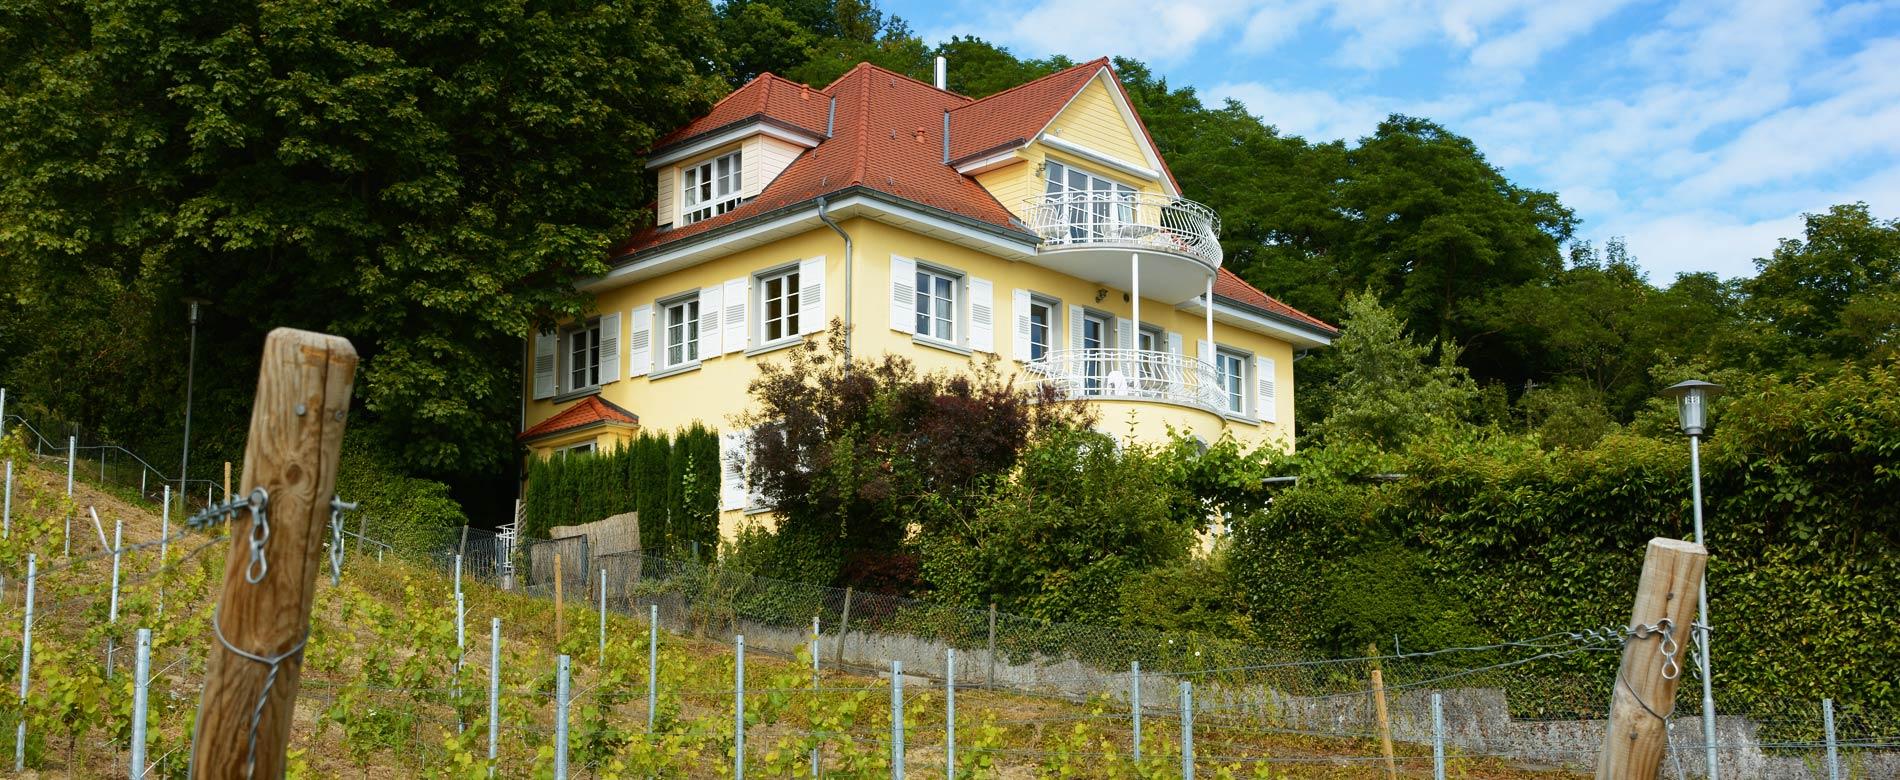 Ferienwohnung Pfarrhaus in Meersburg - Pfarrhaus 1